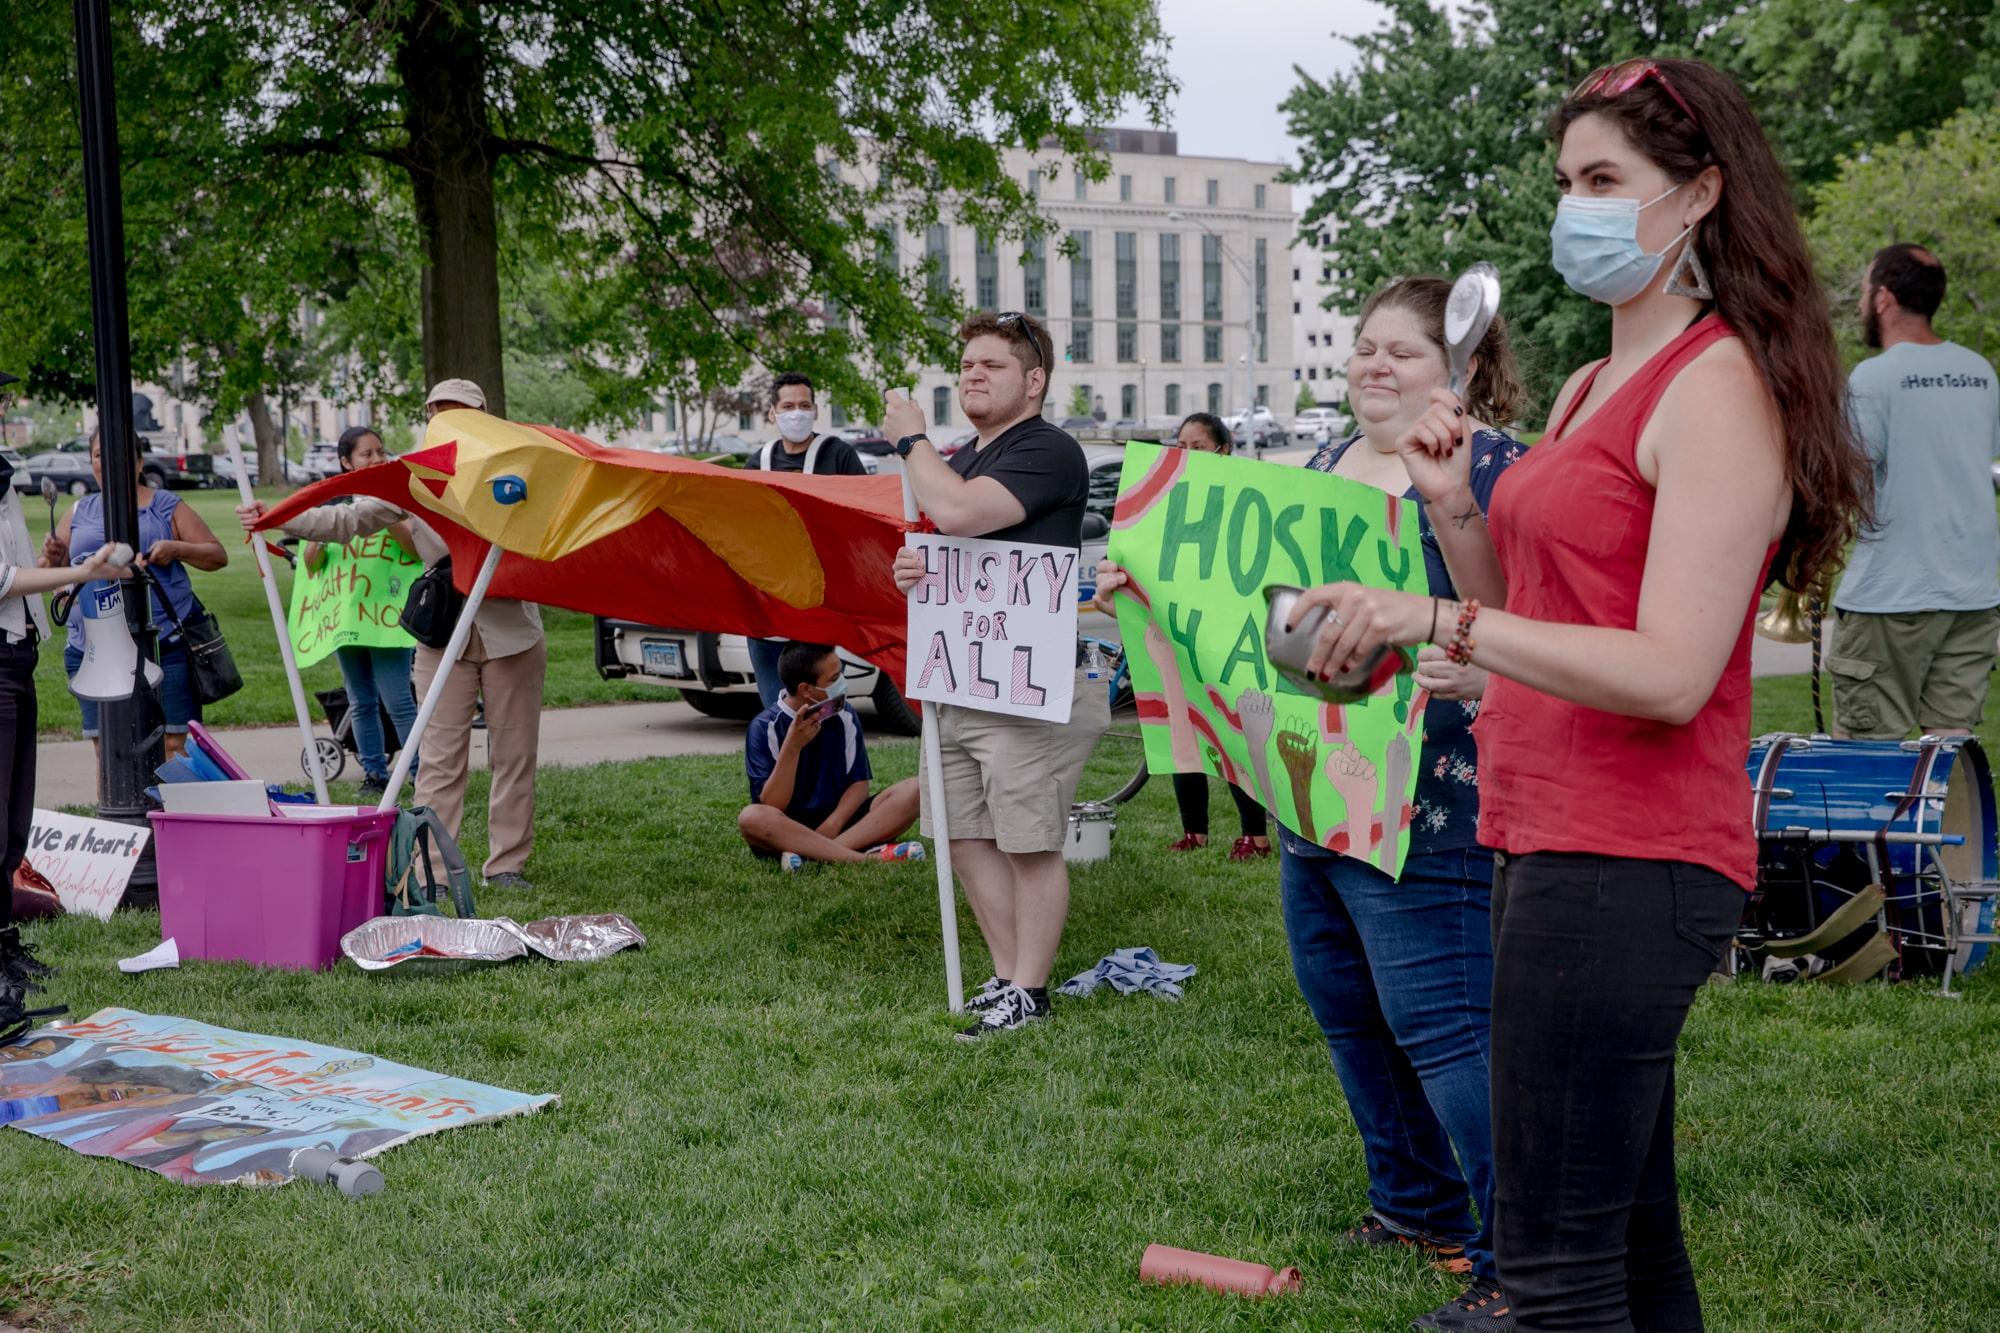 Legislators pursue HUSKY expansion for CT's undocumented children